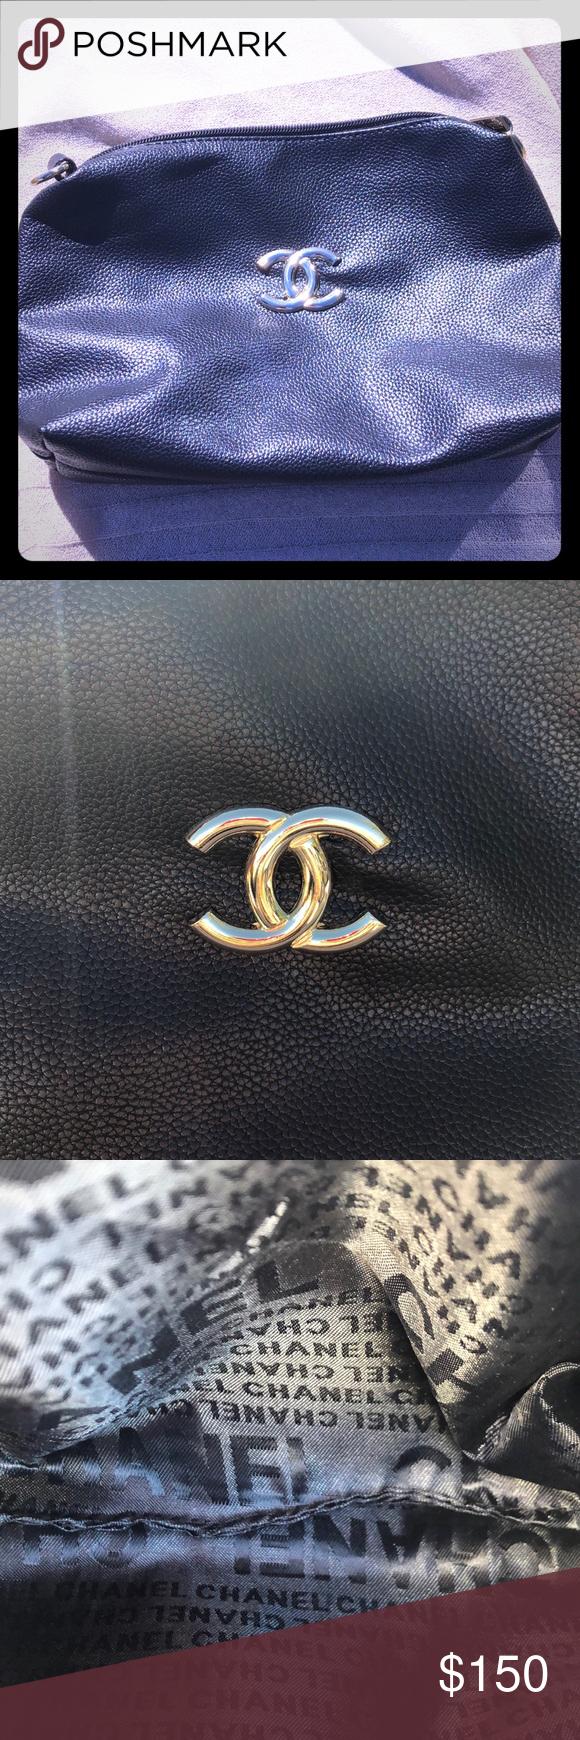 Authentic CHANEL Black Bag Authentic Super Cute Small